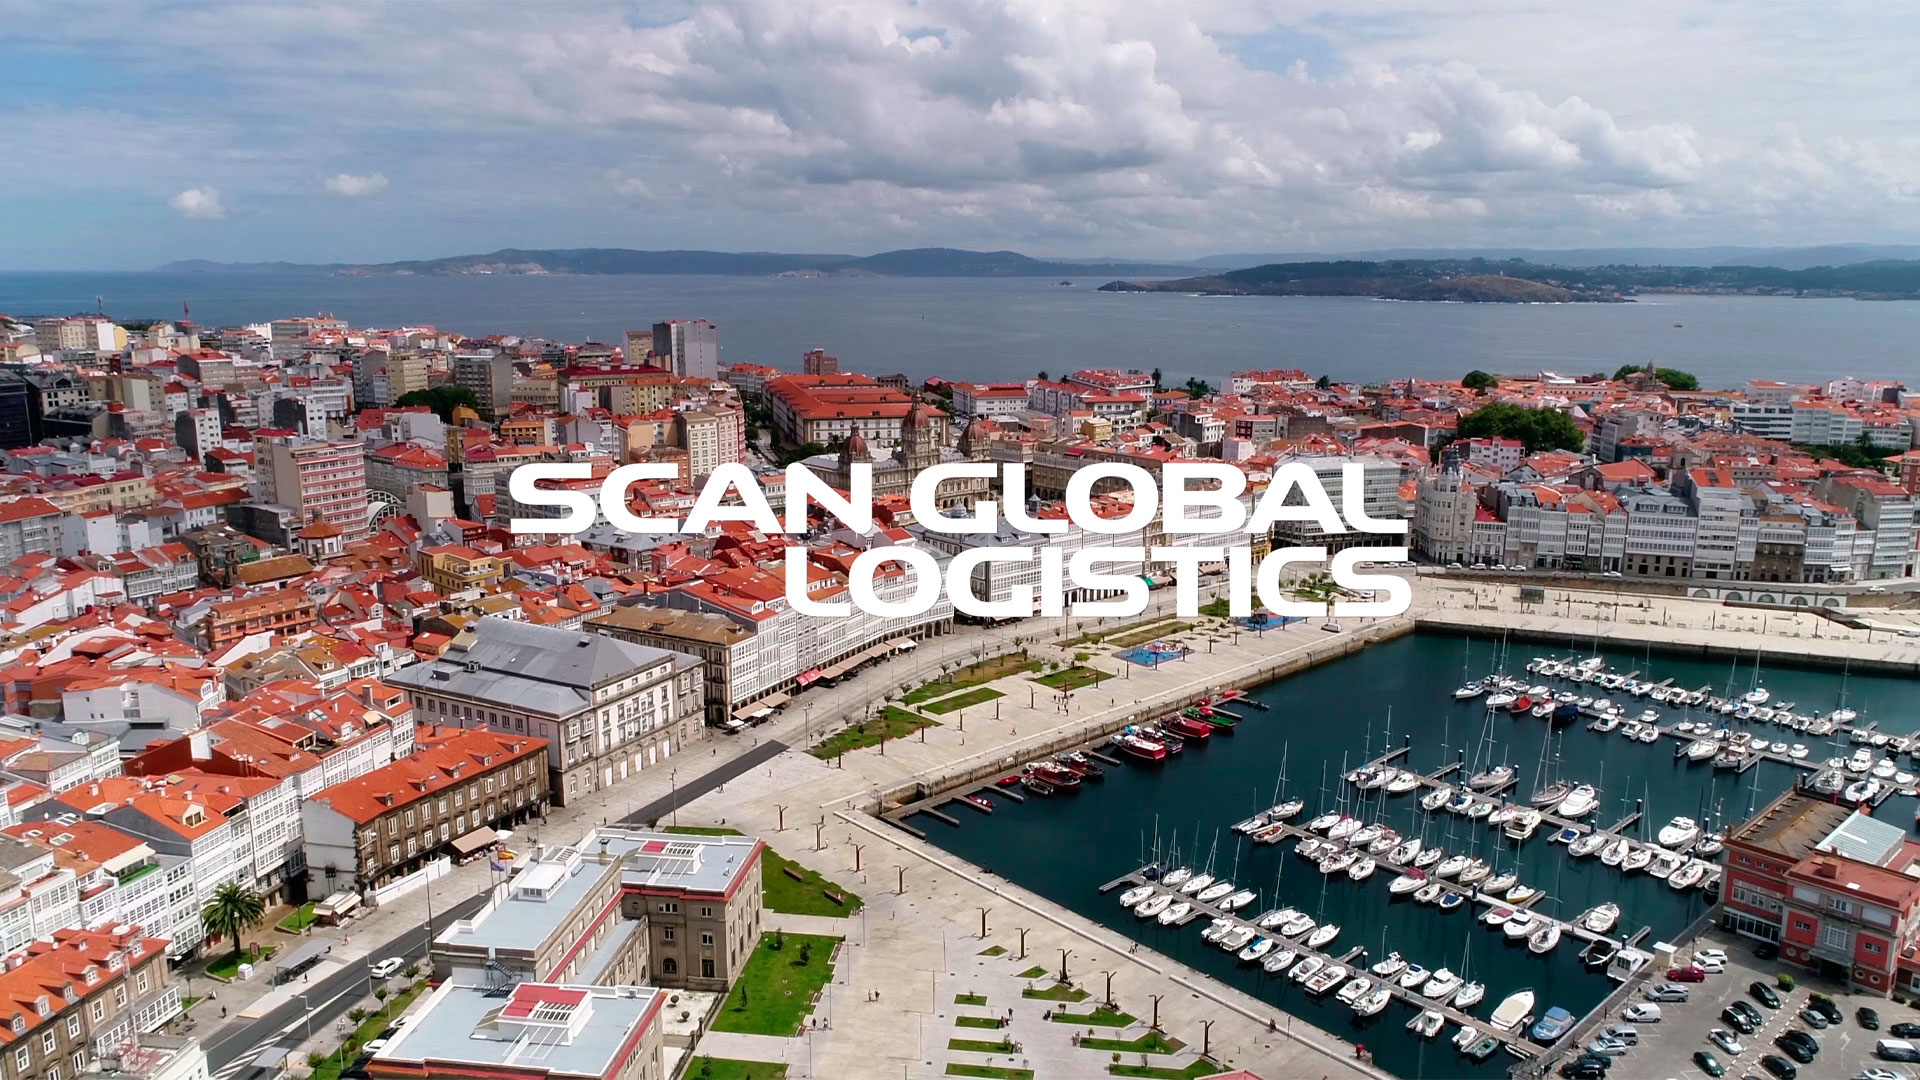 Promo Scan Global Logistics